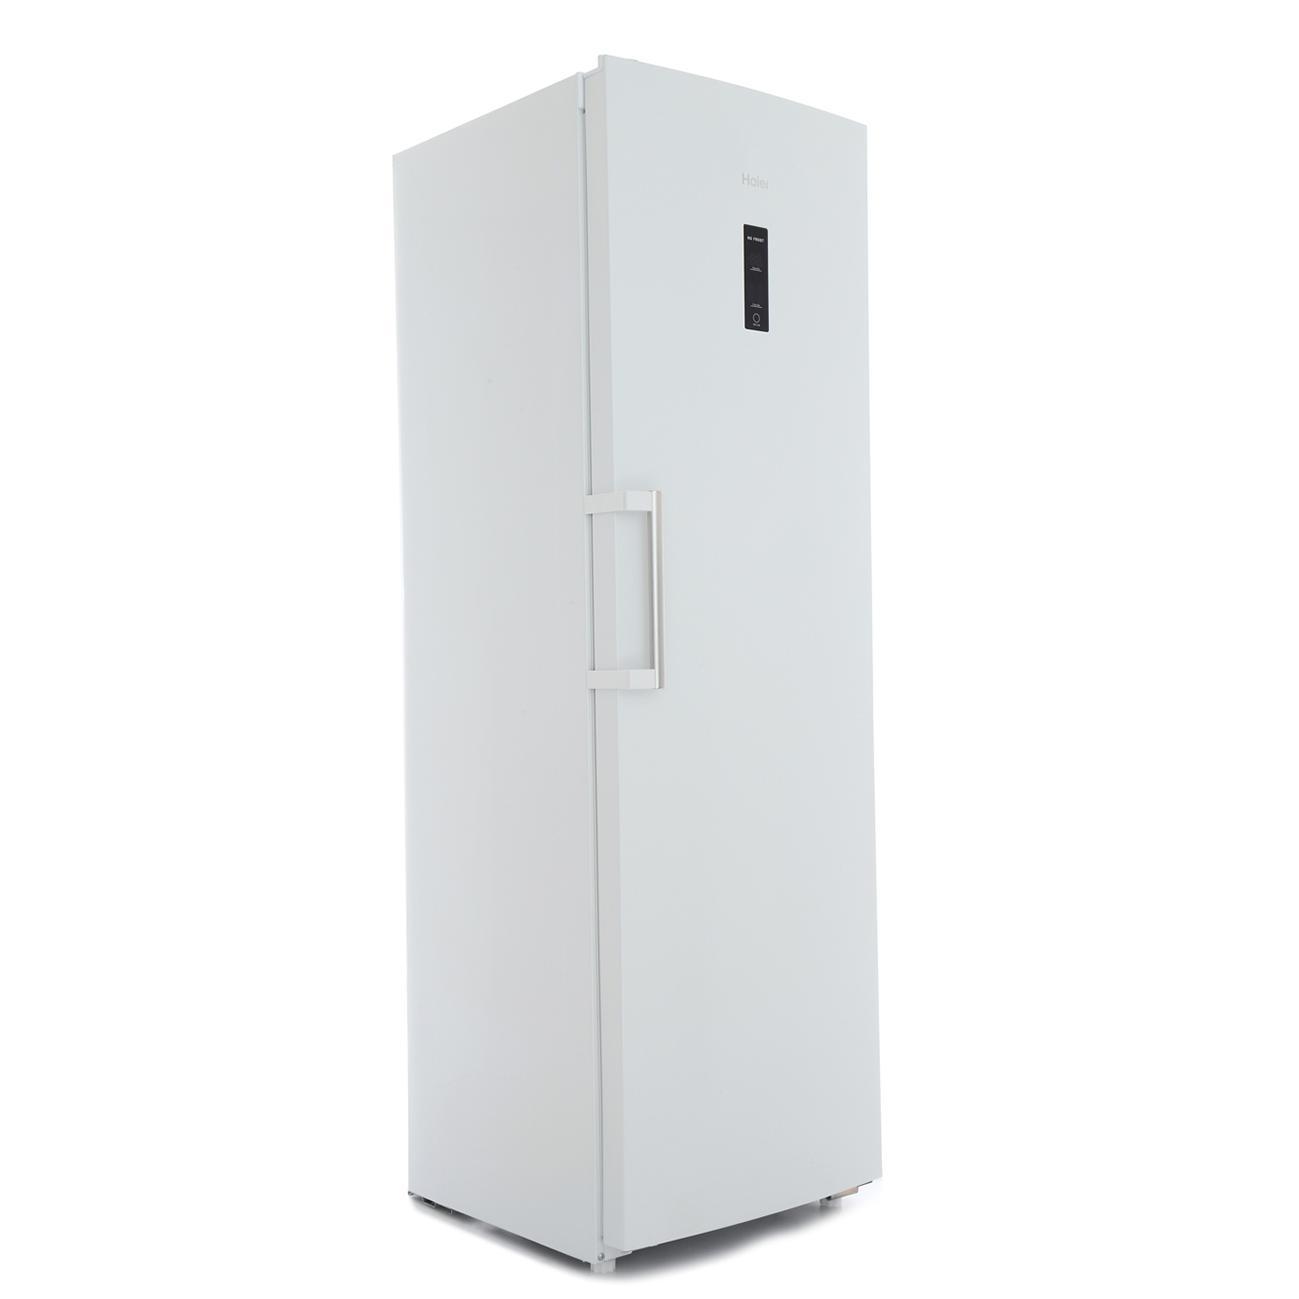 Haier HF-255WAA Tall Freezer